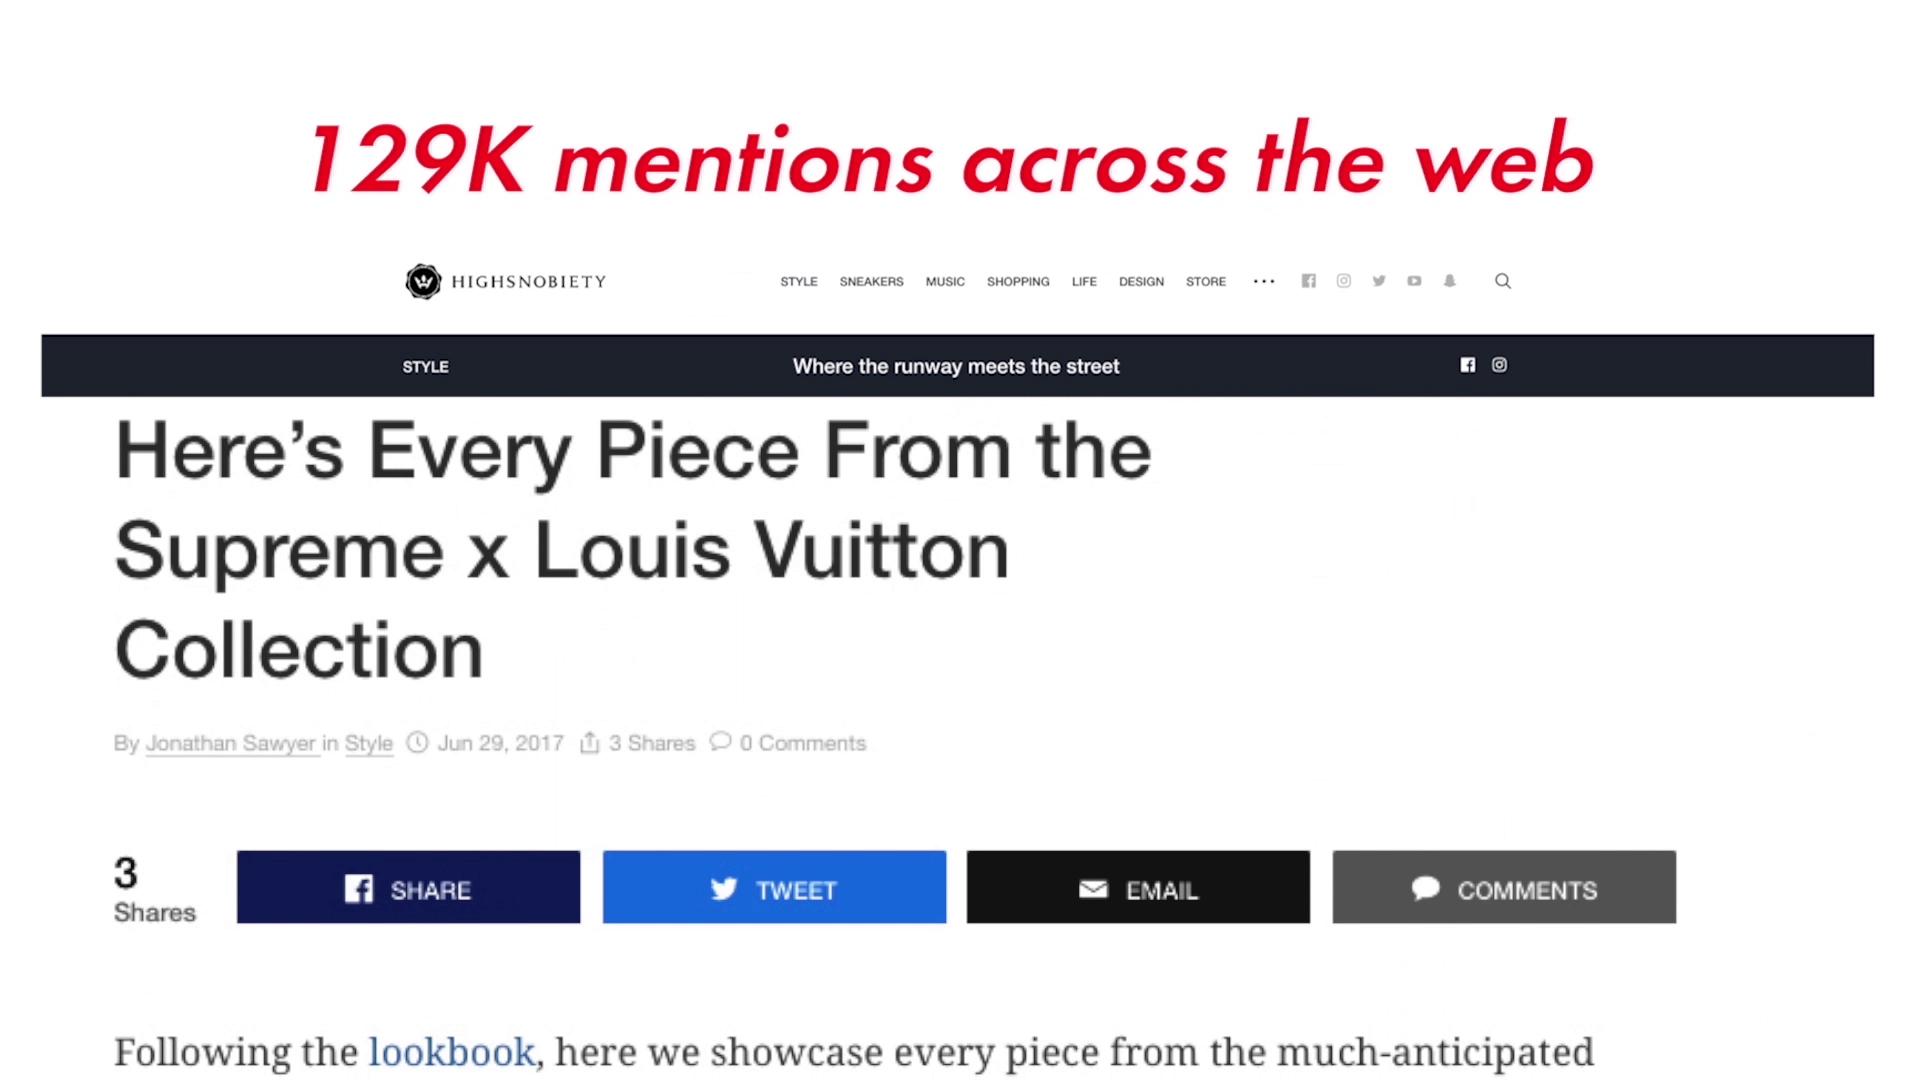 Thumbnail for Louis Vuitton x Supreme